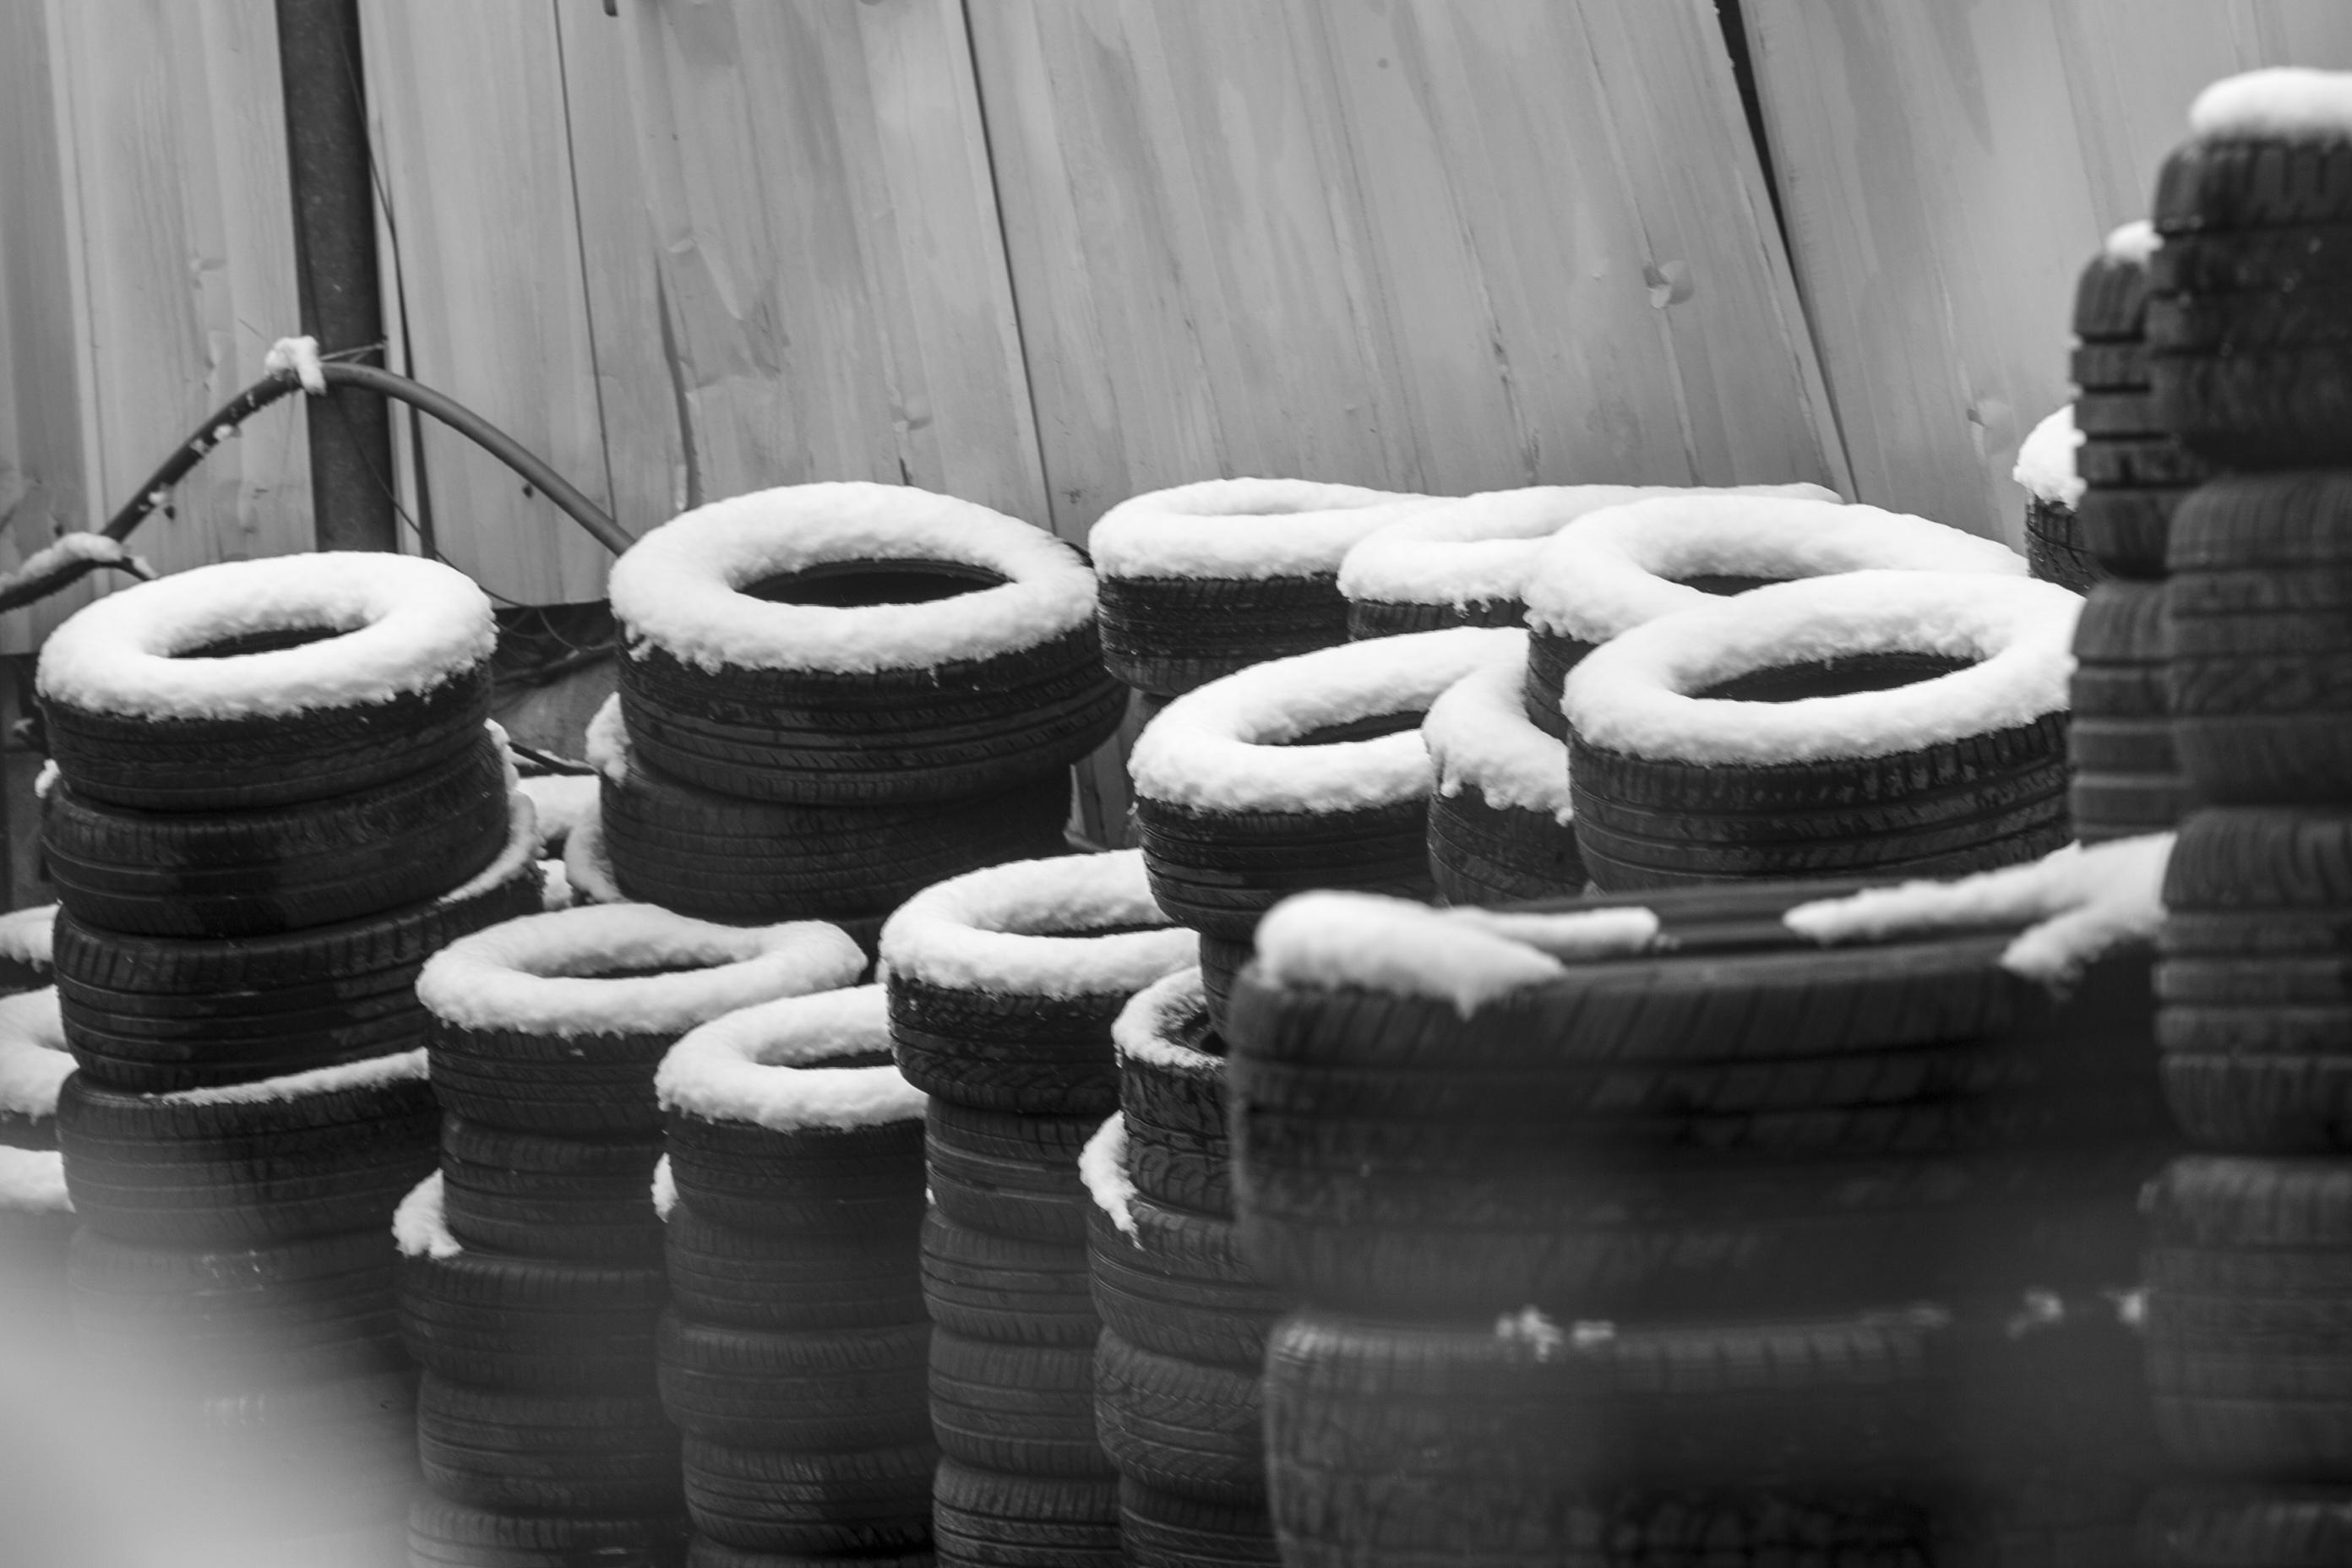 Tire Repair Near Me Open Sunday >> Tire Repair Shop Near Me Open Sunday